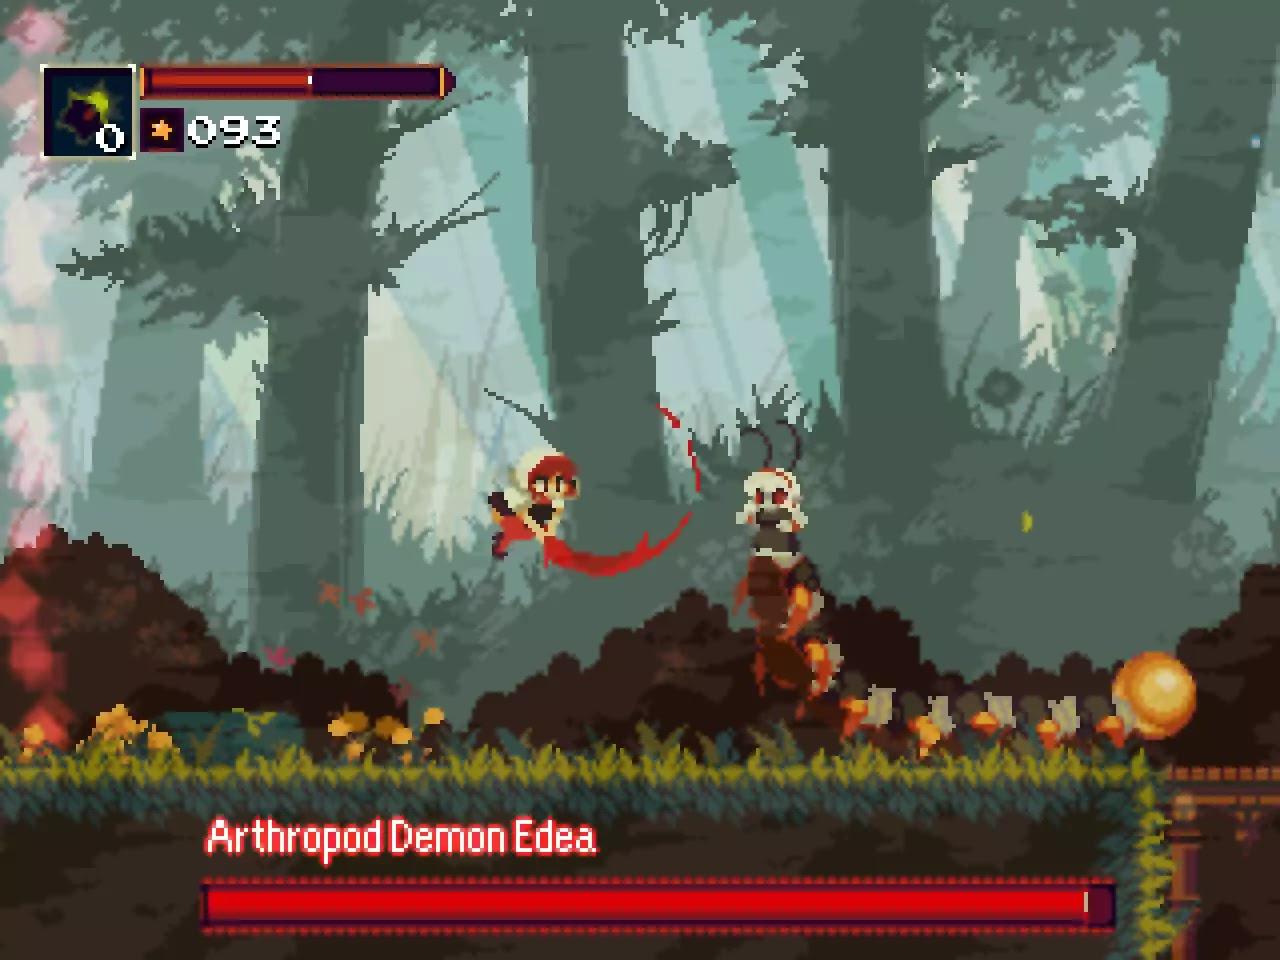 Momodora Reverie Under the Moonlight game screenshots